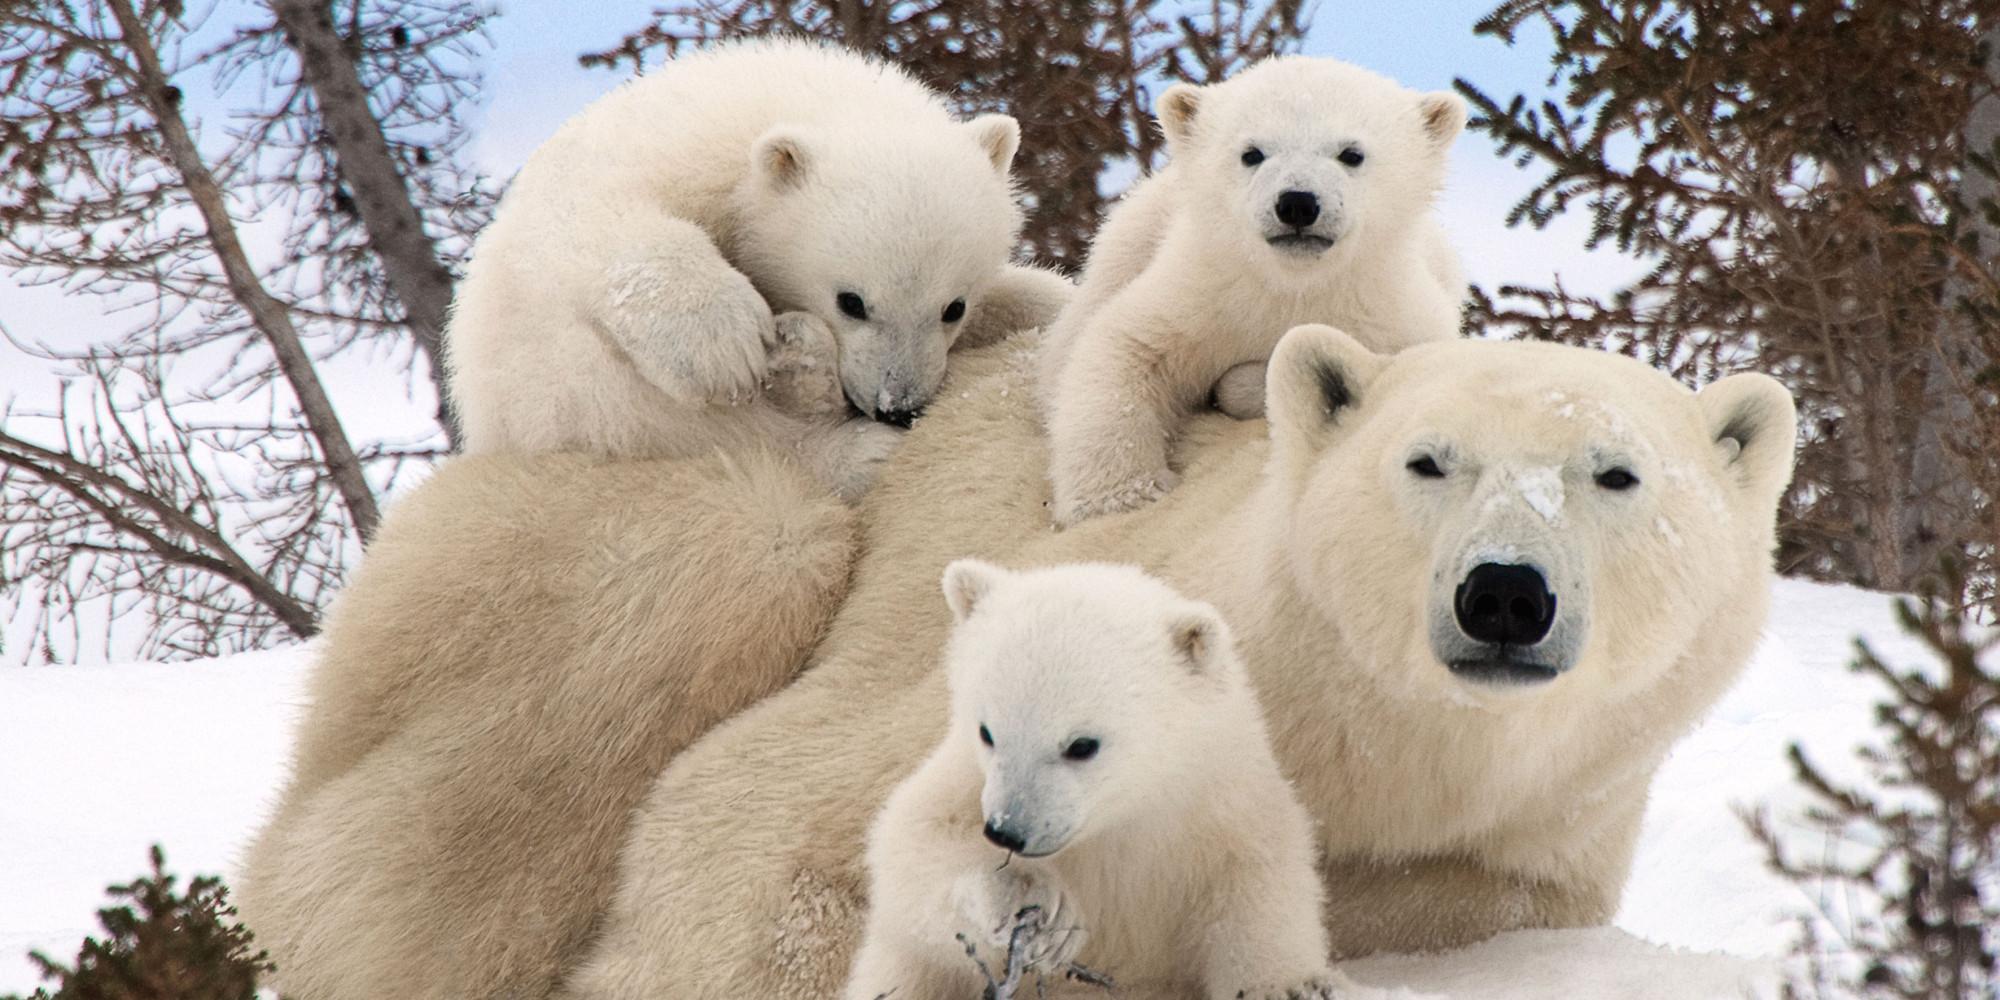 Cute White Teddy Bear Wallpapers Polar Bear Family Portraits Wallpapers13 Com